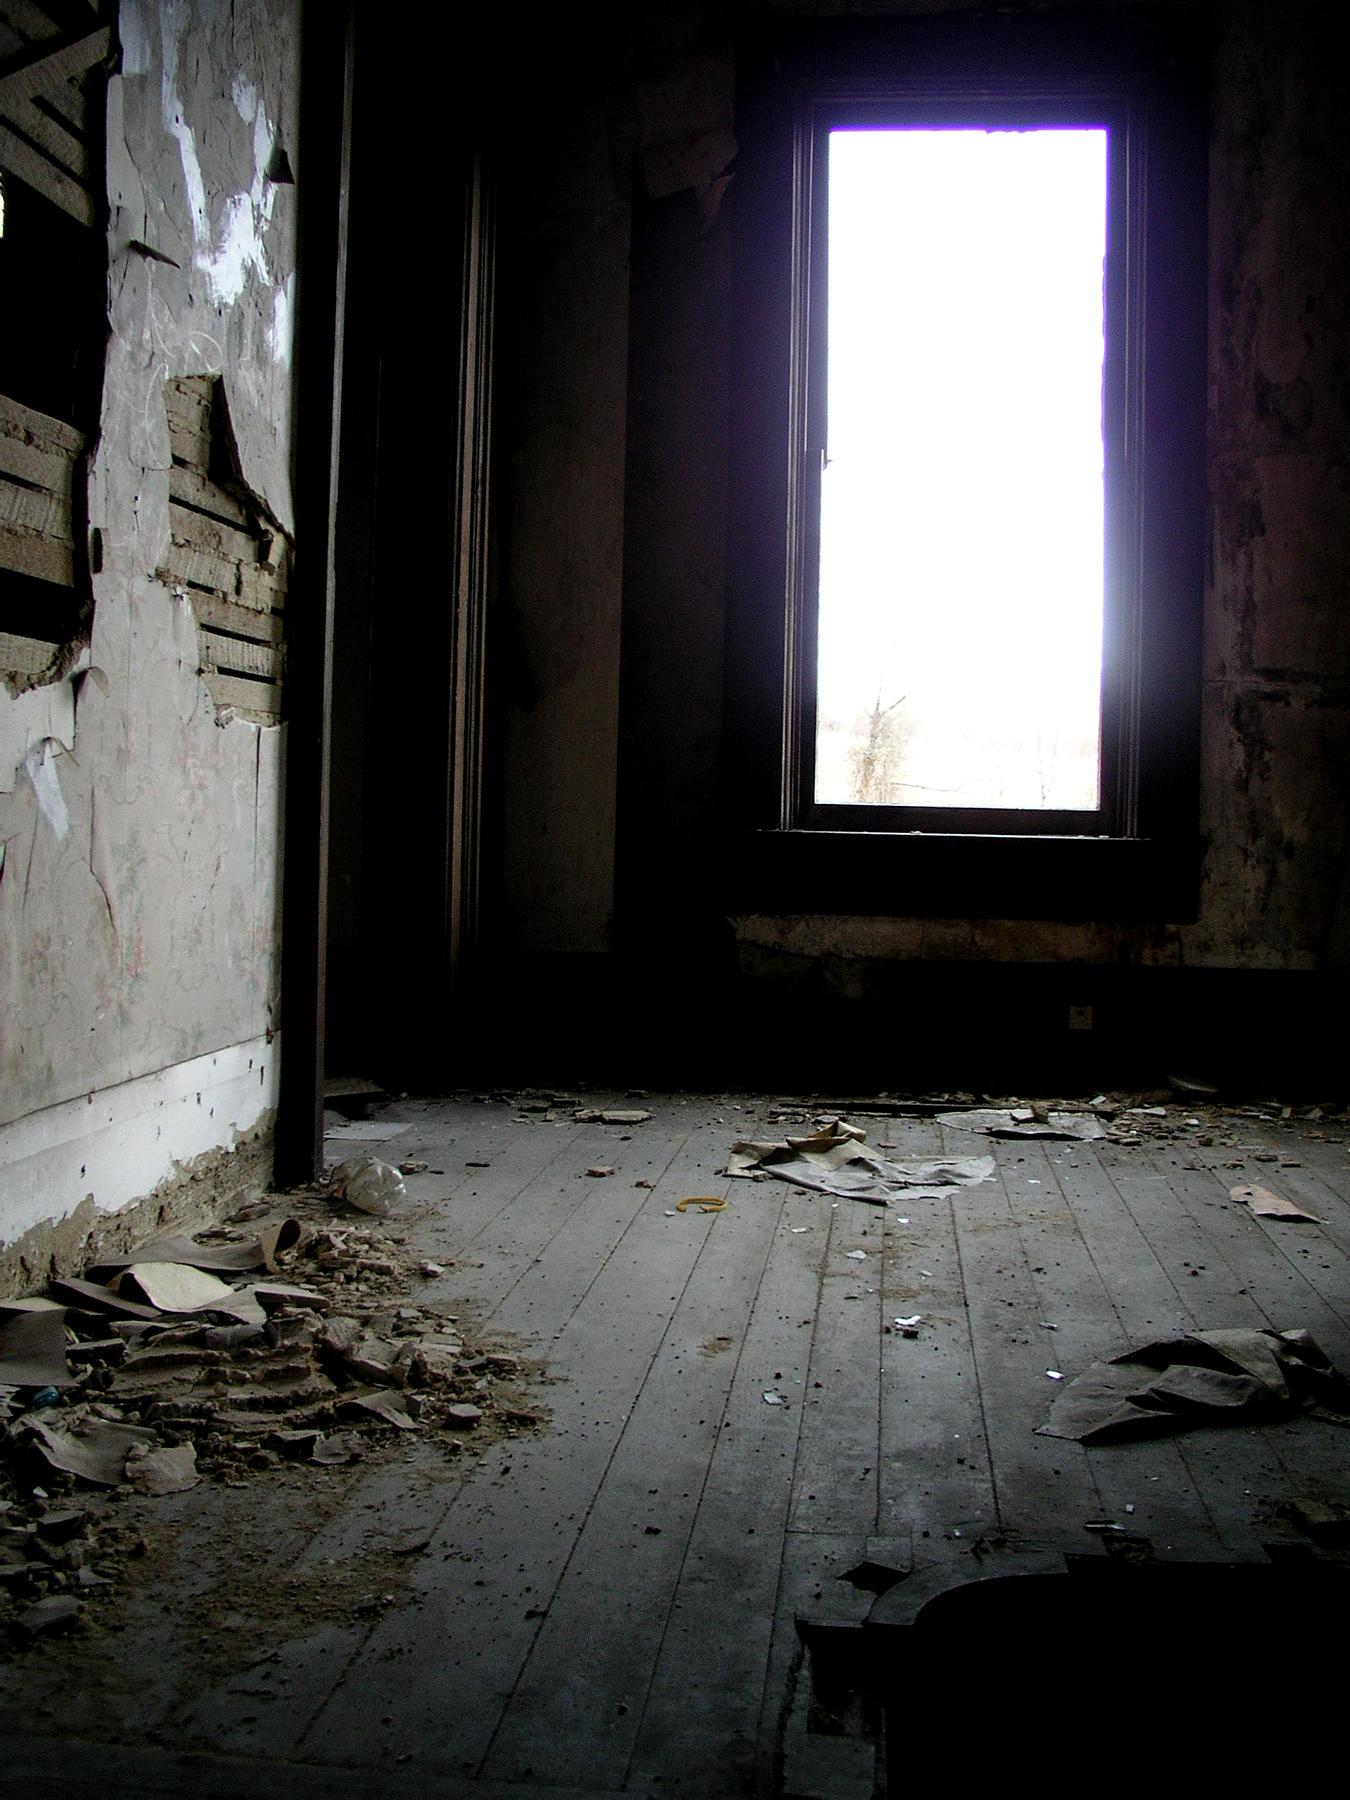 S S Dark Room 4 By Shudder Stock On Deviantart